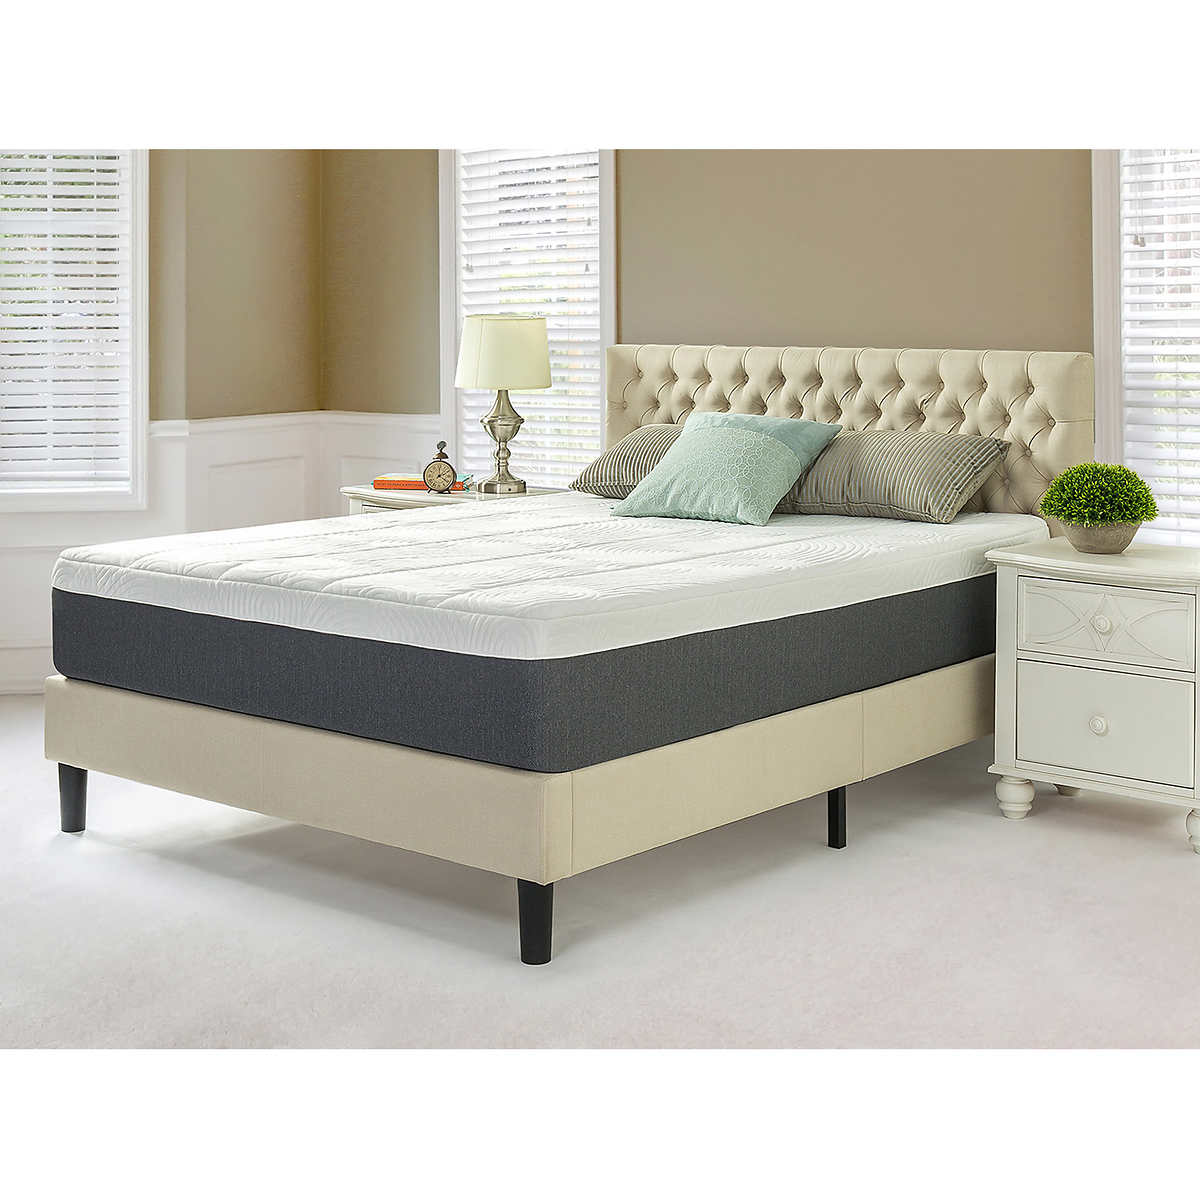 blackstone king set 12 memory foam mattress and platform bed